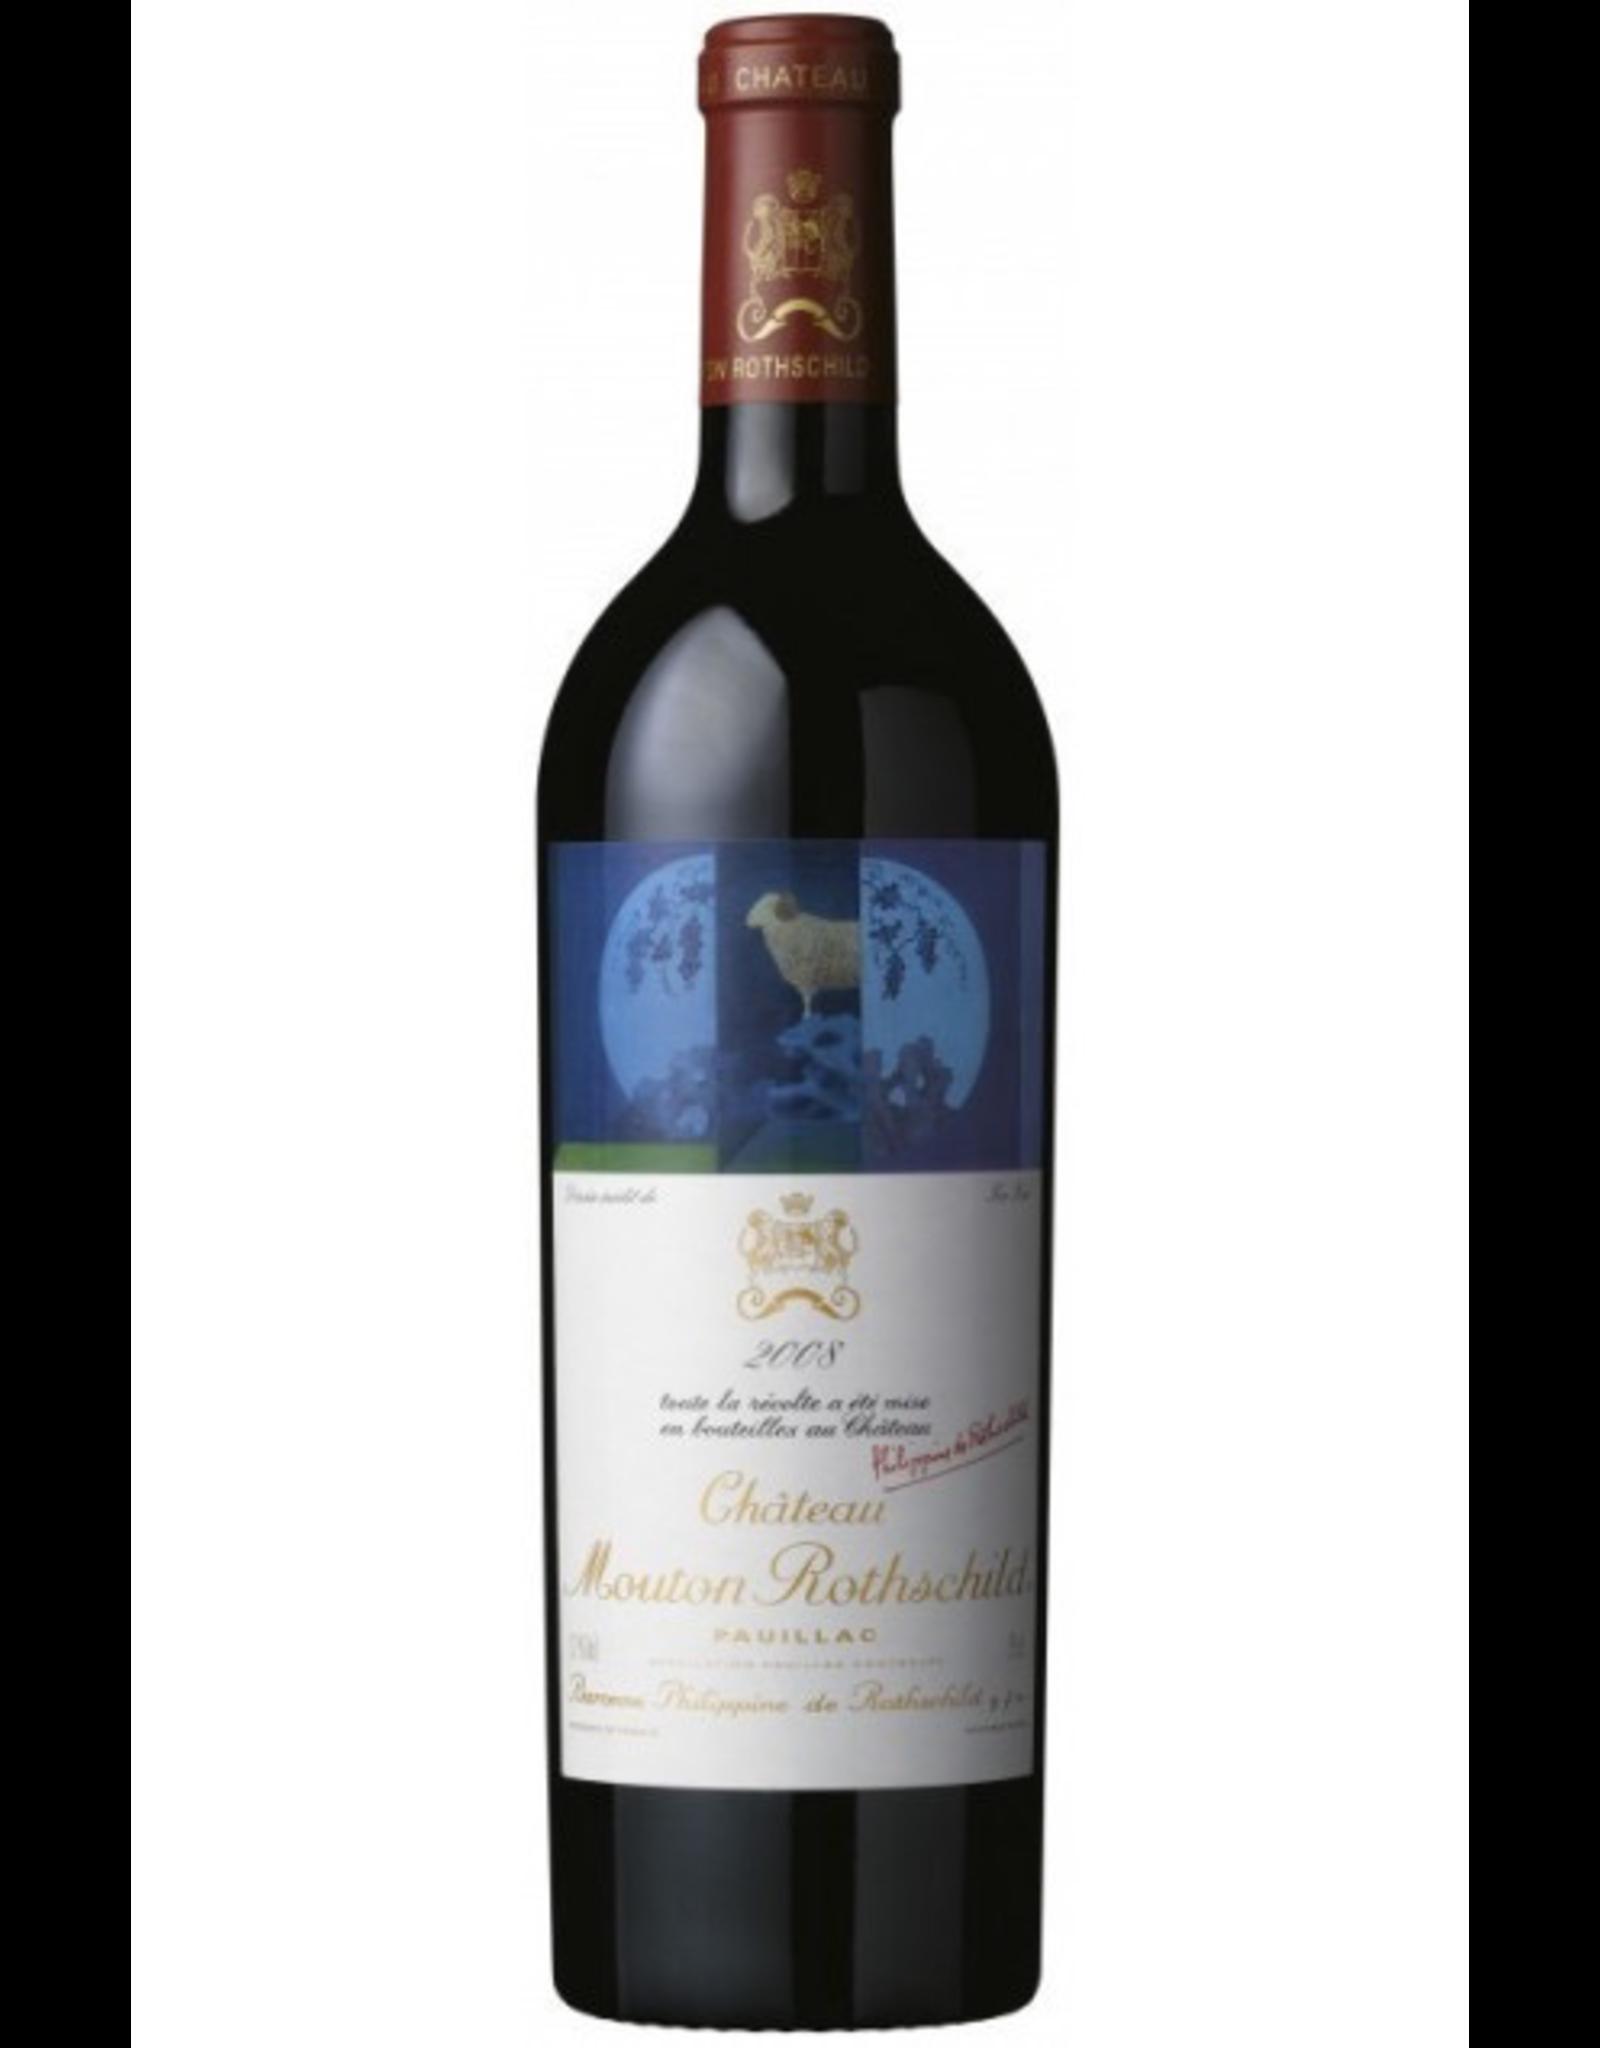 Red Wine 2008, Chateau Mouton-Rothschild 1st Growth, Red Bordeaux Blend, Pauillac, Bordeaux, France, 13.55% Alc, CT94.3